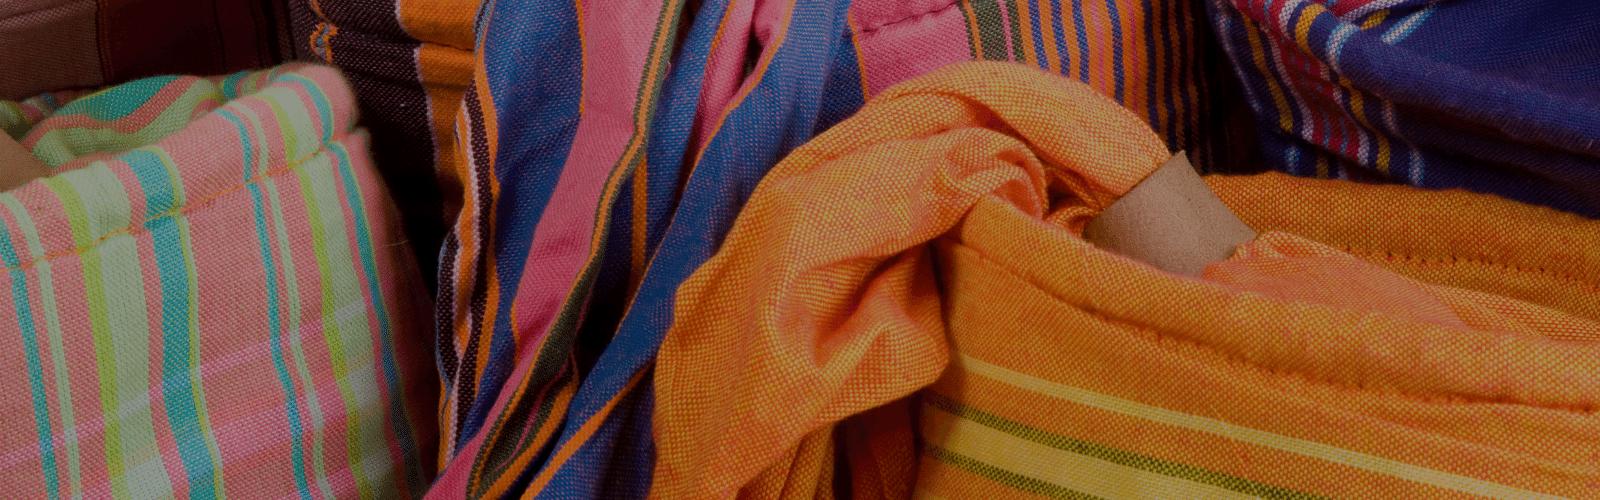 African Meraki - African Gifts - Tote,Travel & Toiletry Bags